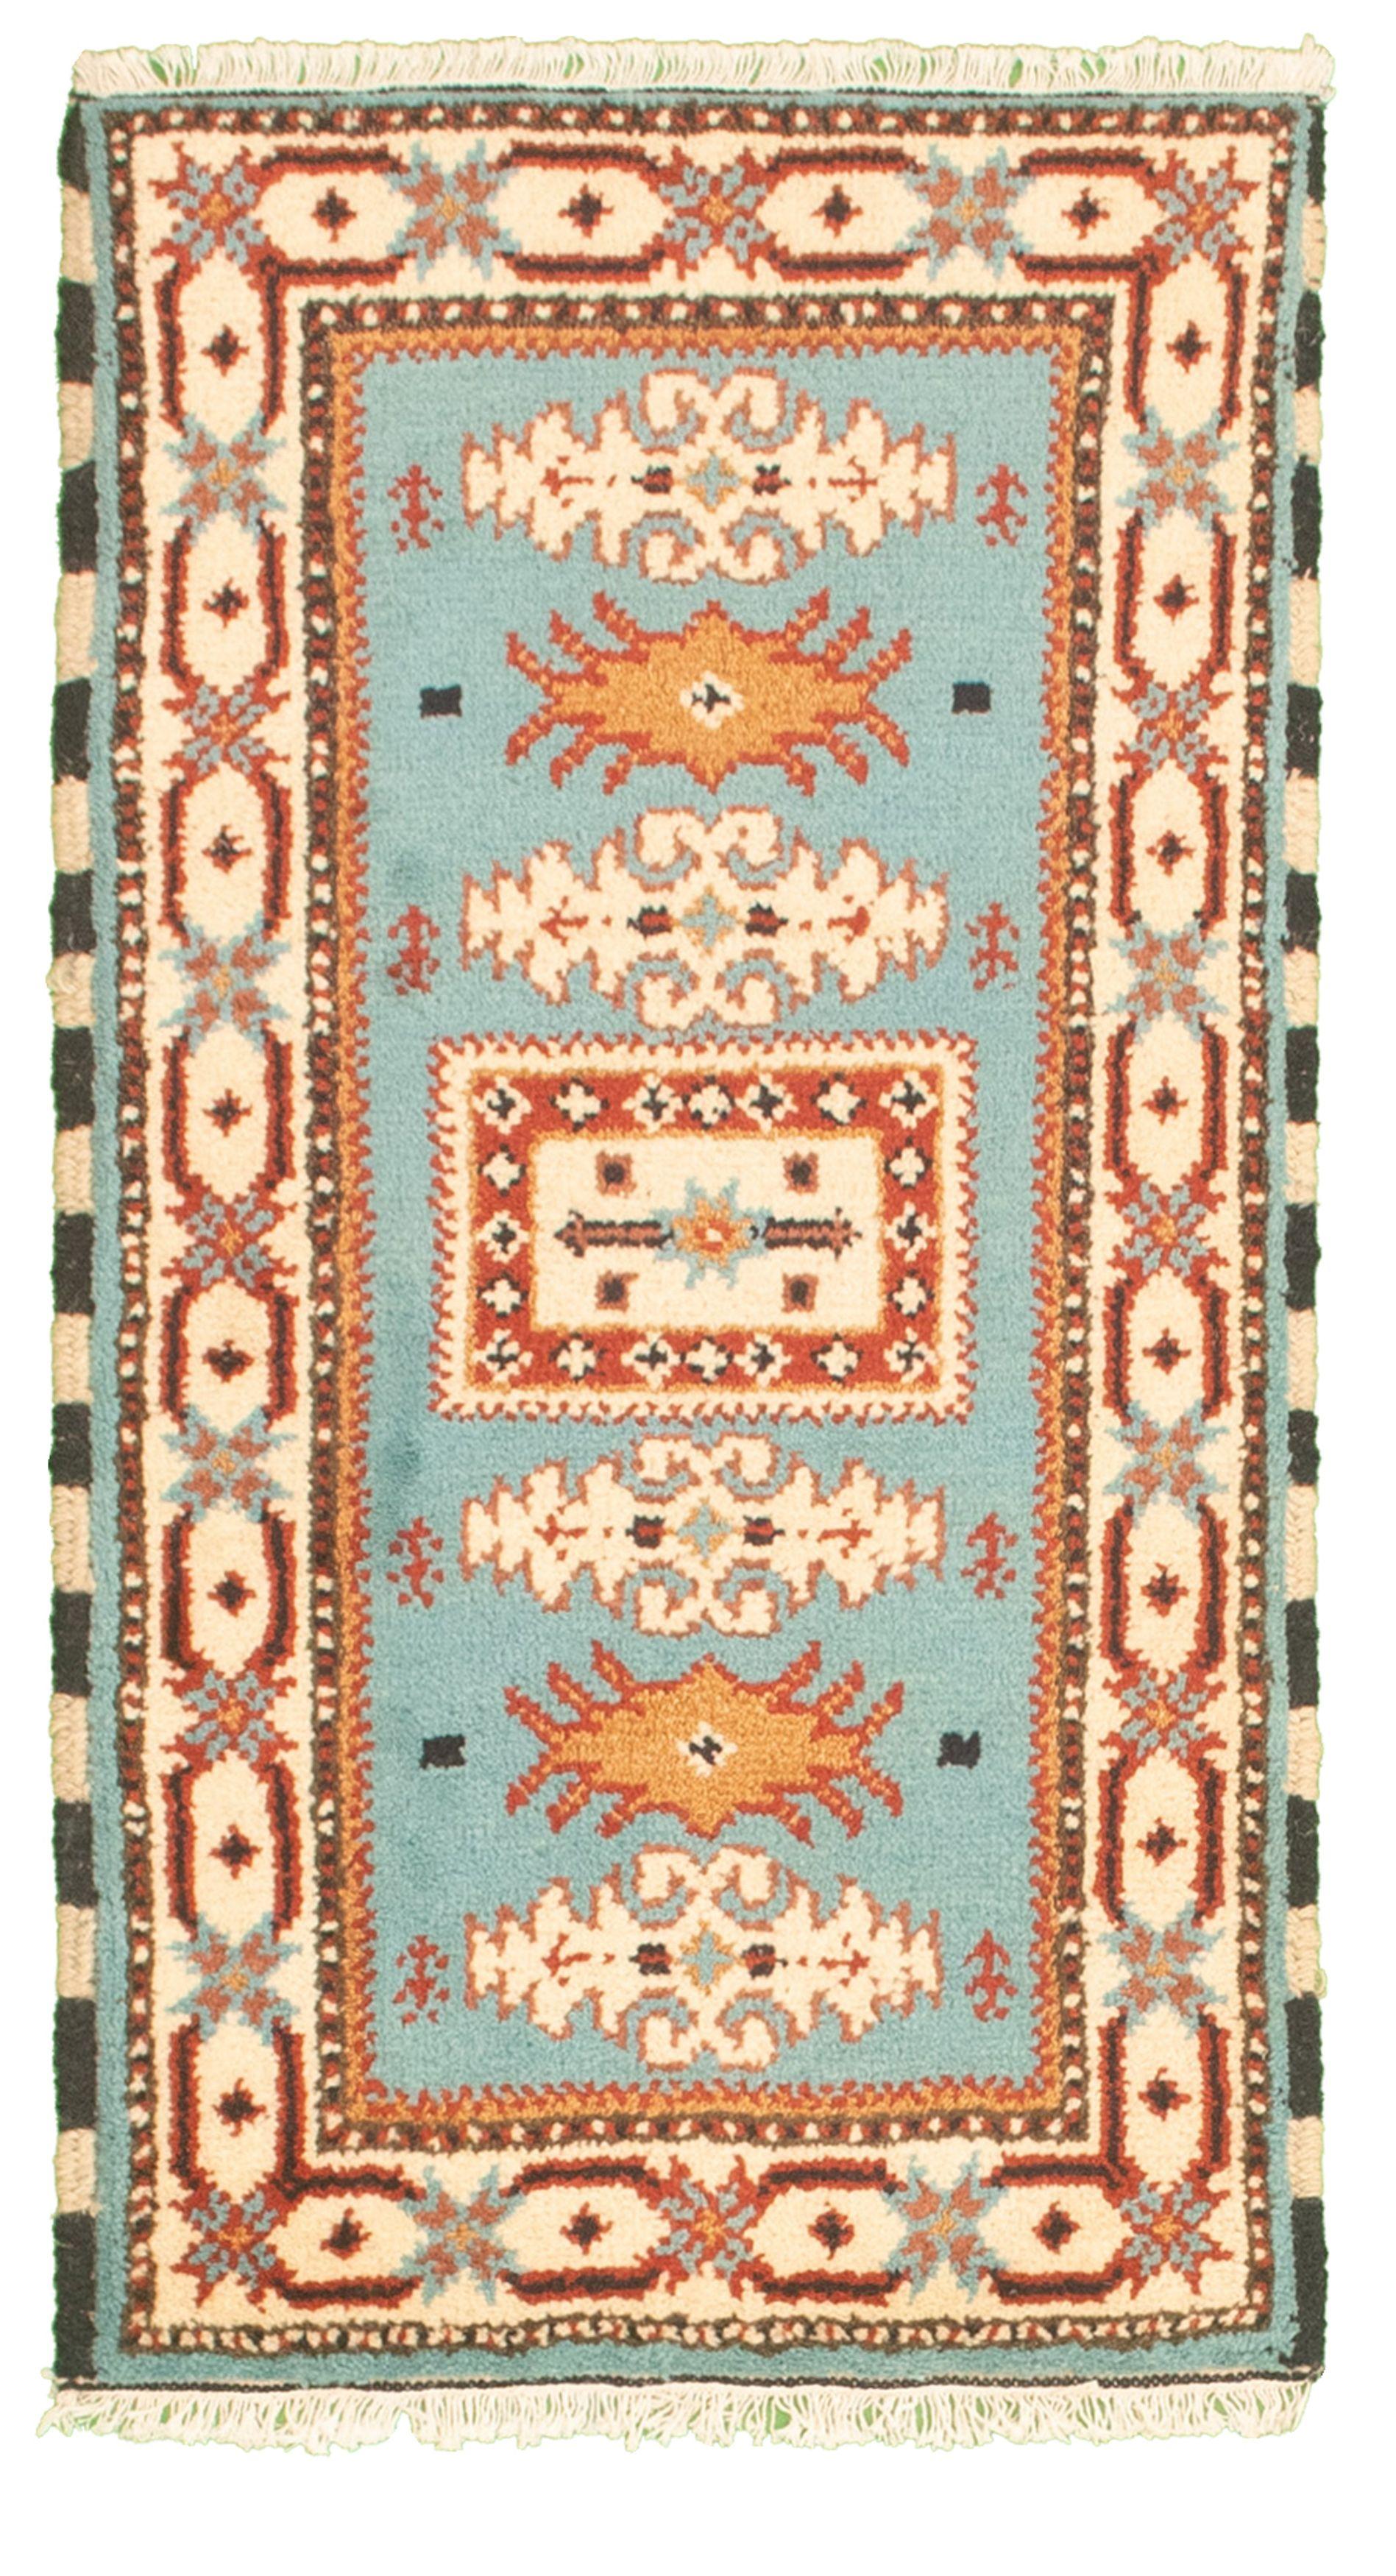 "Hand-knotted Royal Kazak Sky Blue Cotton Rug 2'1"" x 4'0""  Size: 2'1"" x 4'0"""